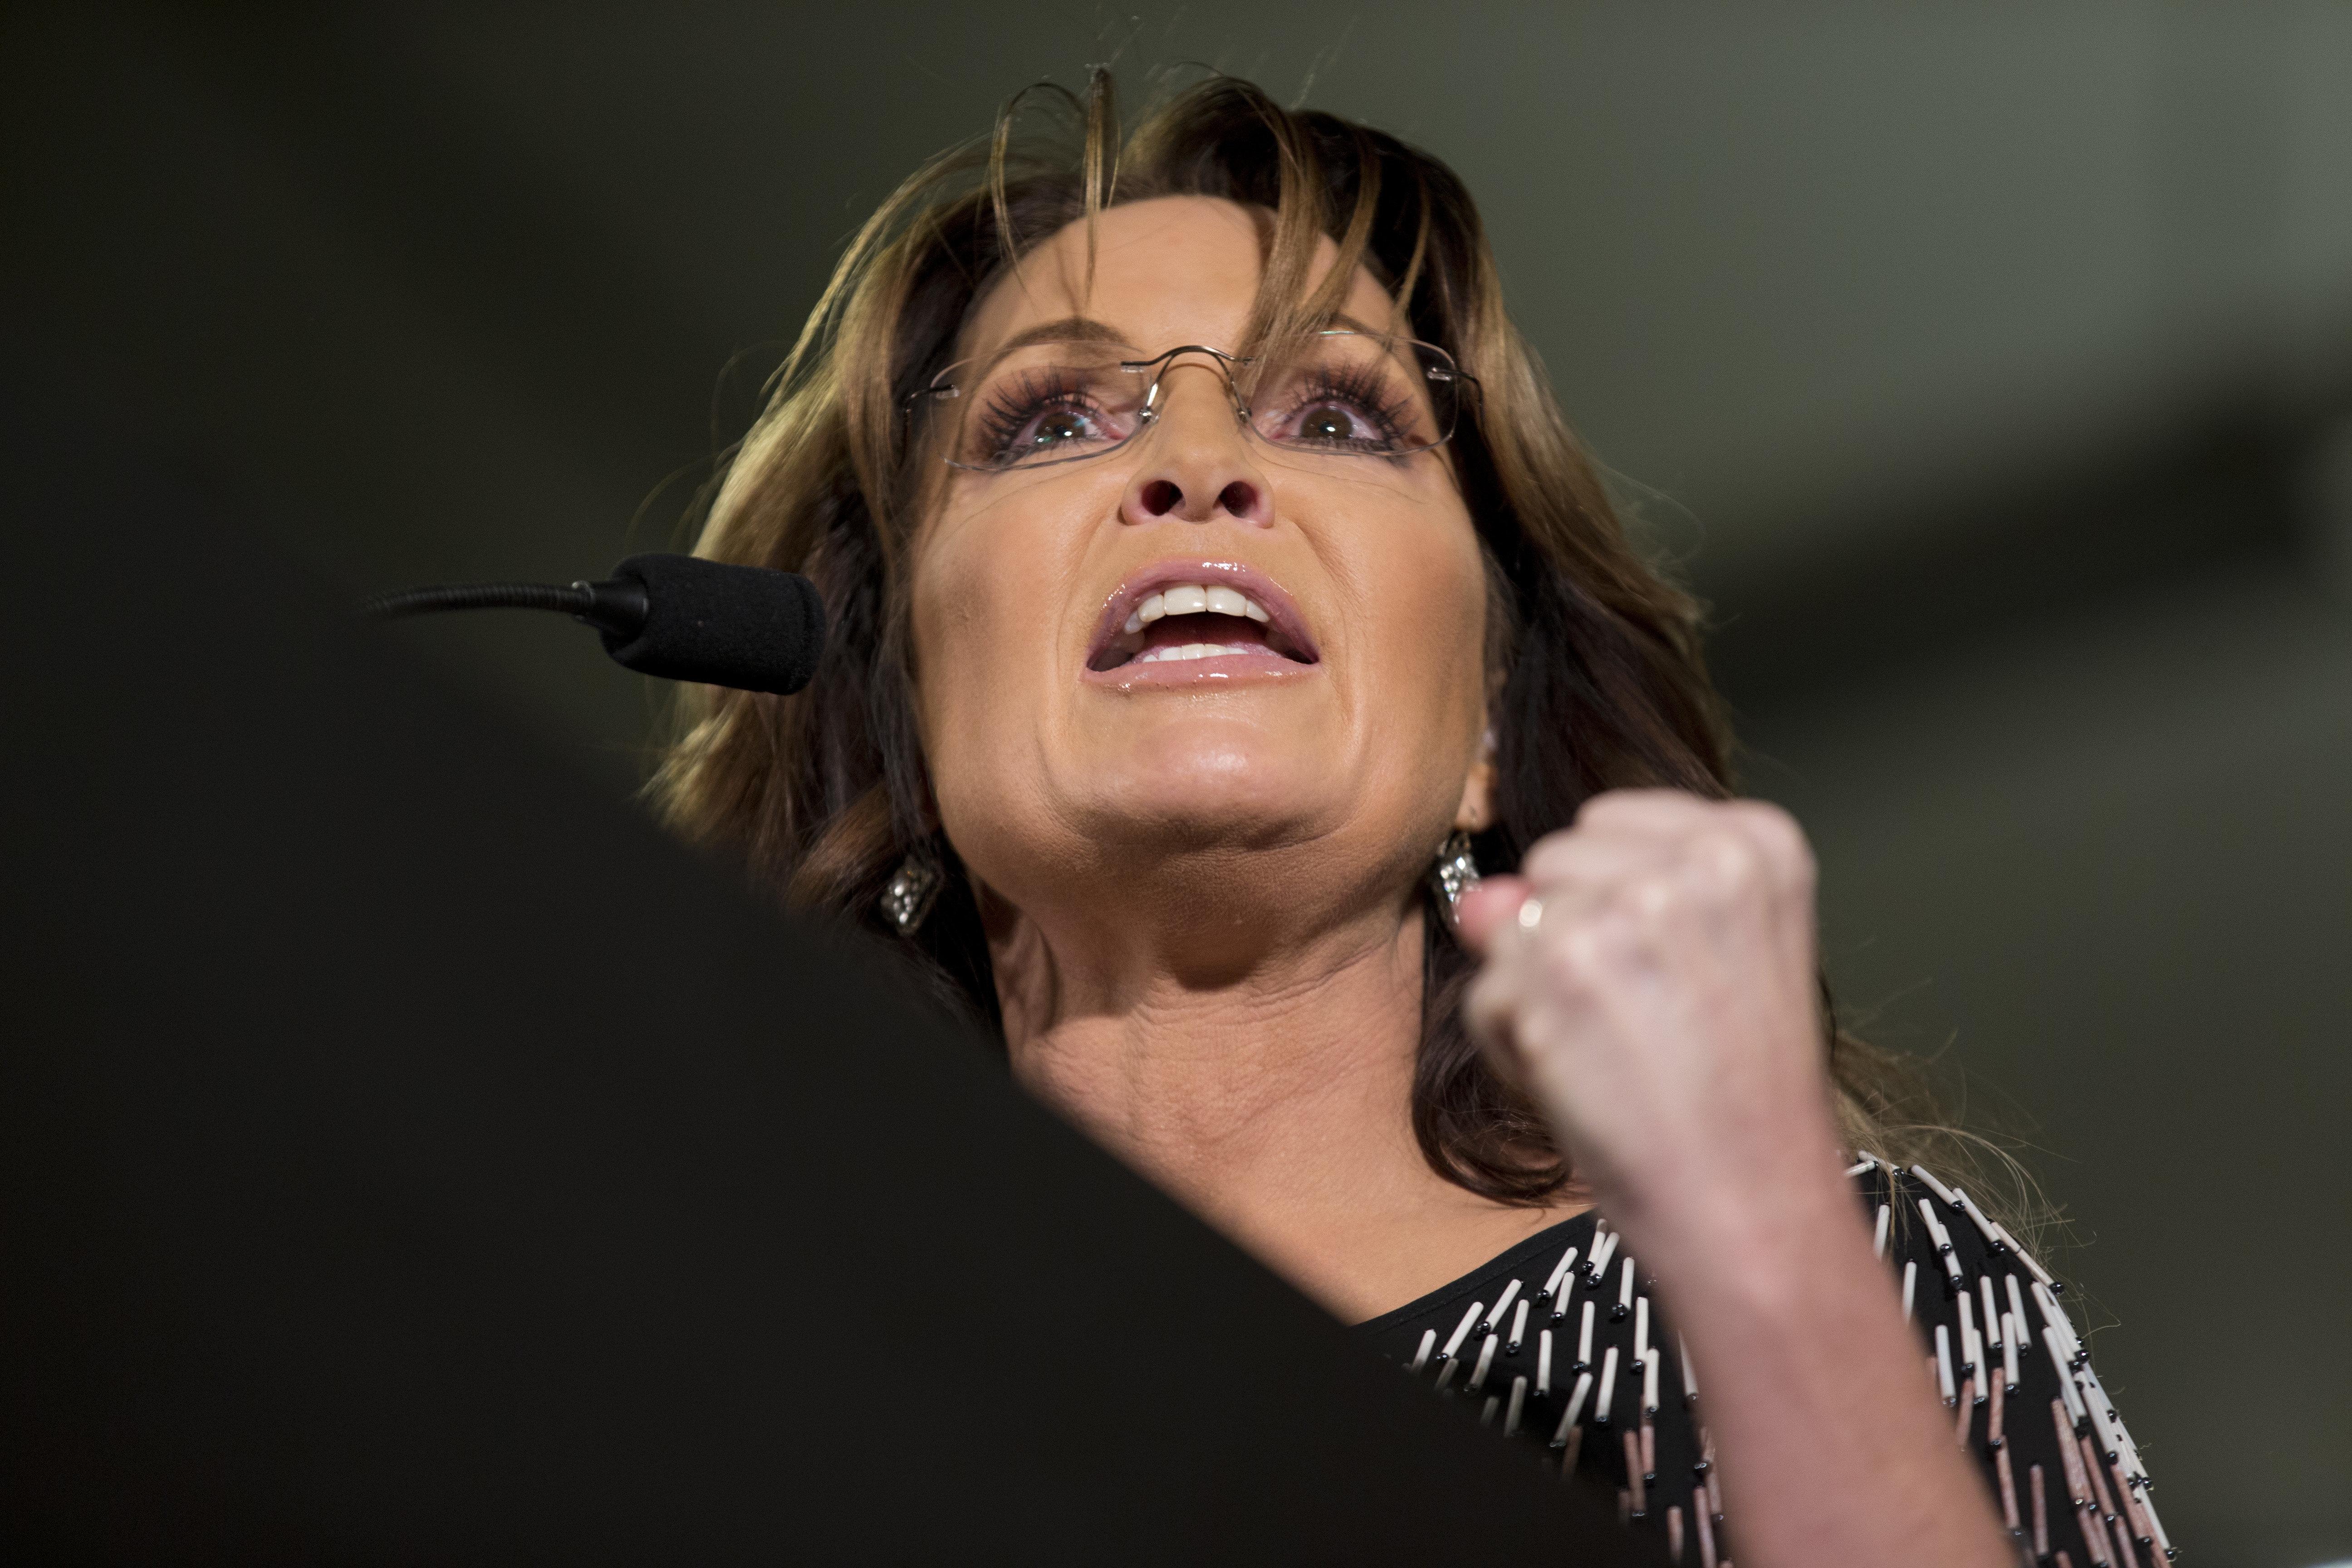 In January, former Alaska Gov. Sarah Palin endorsed presidential candidate Donald Trump.